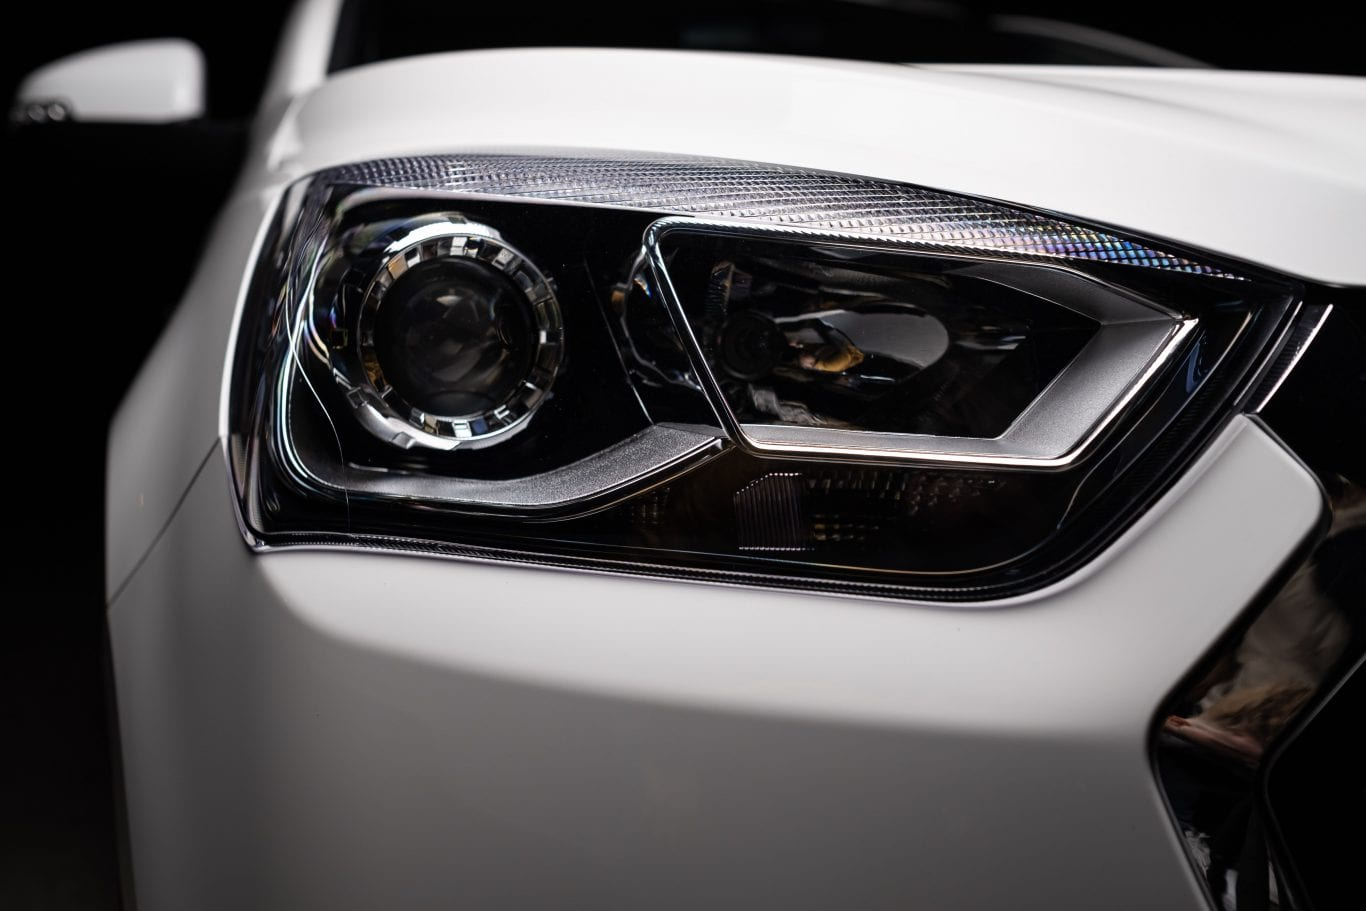 JAC – Auto Kunz ist offiziell neuer Generalimporteur - Auto Kunz AG